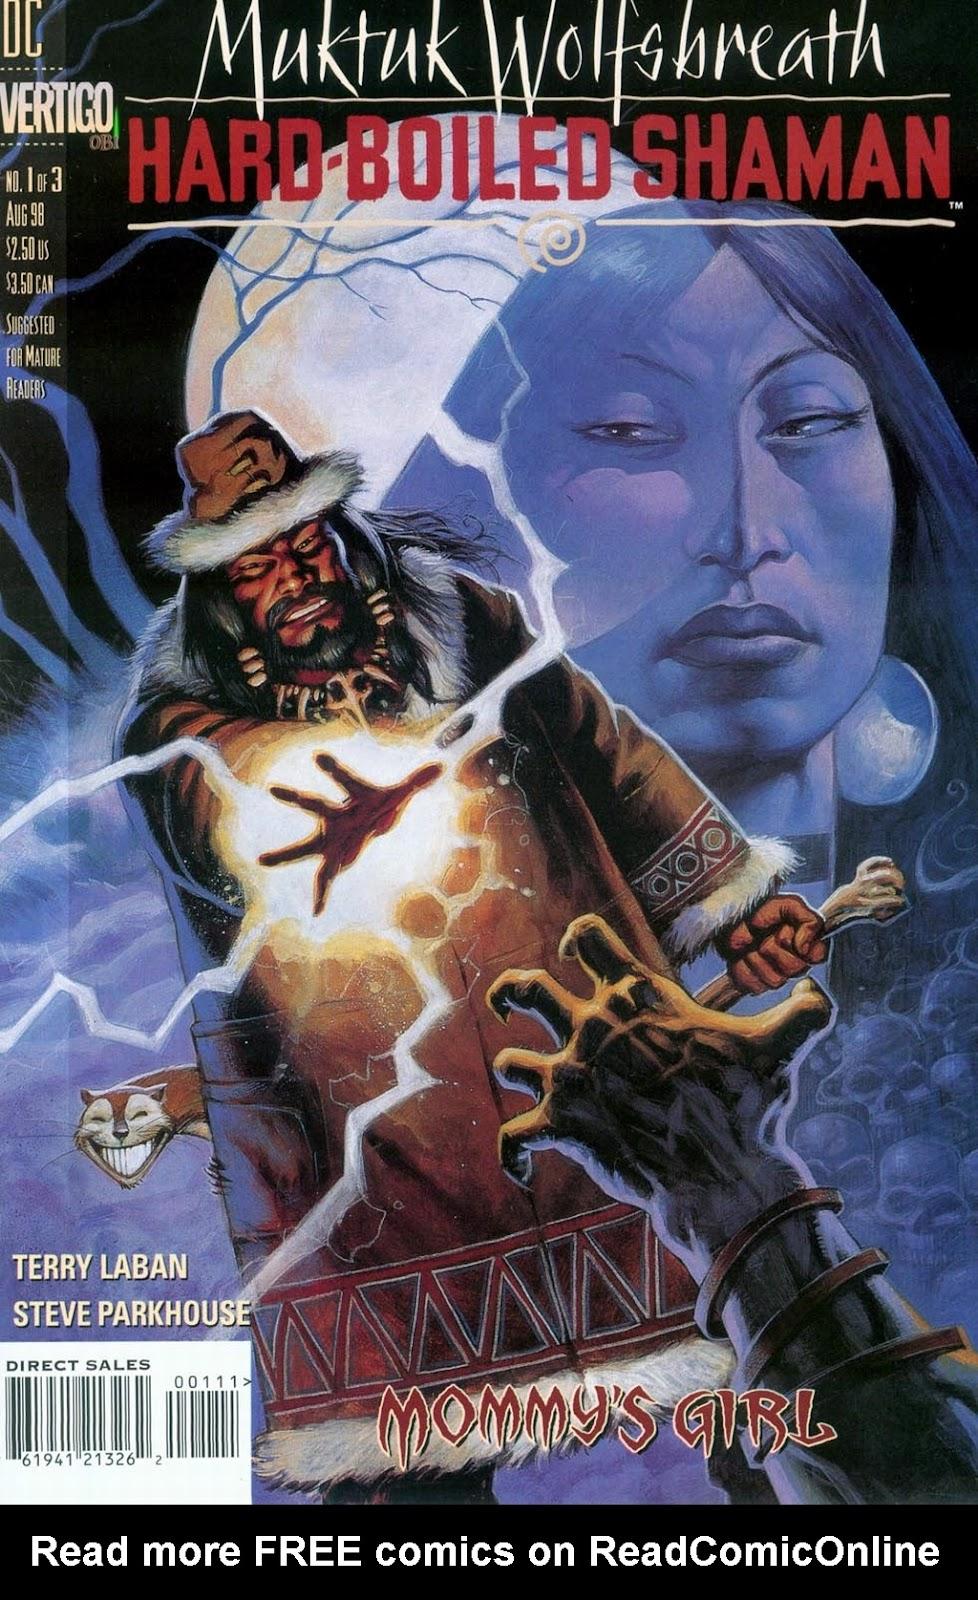 Muktuk Wolfsbreath: Hard-Boiled Shaman issue 1 - Page 1